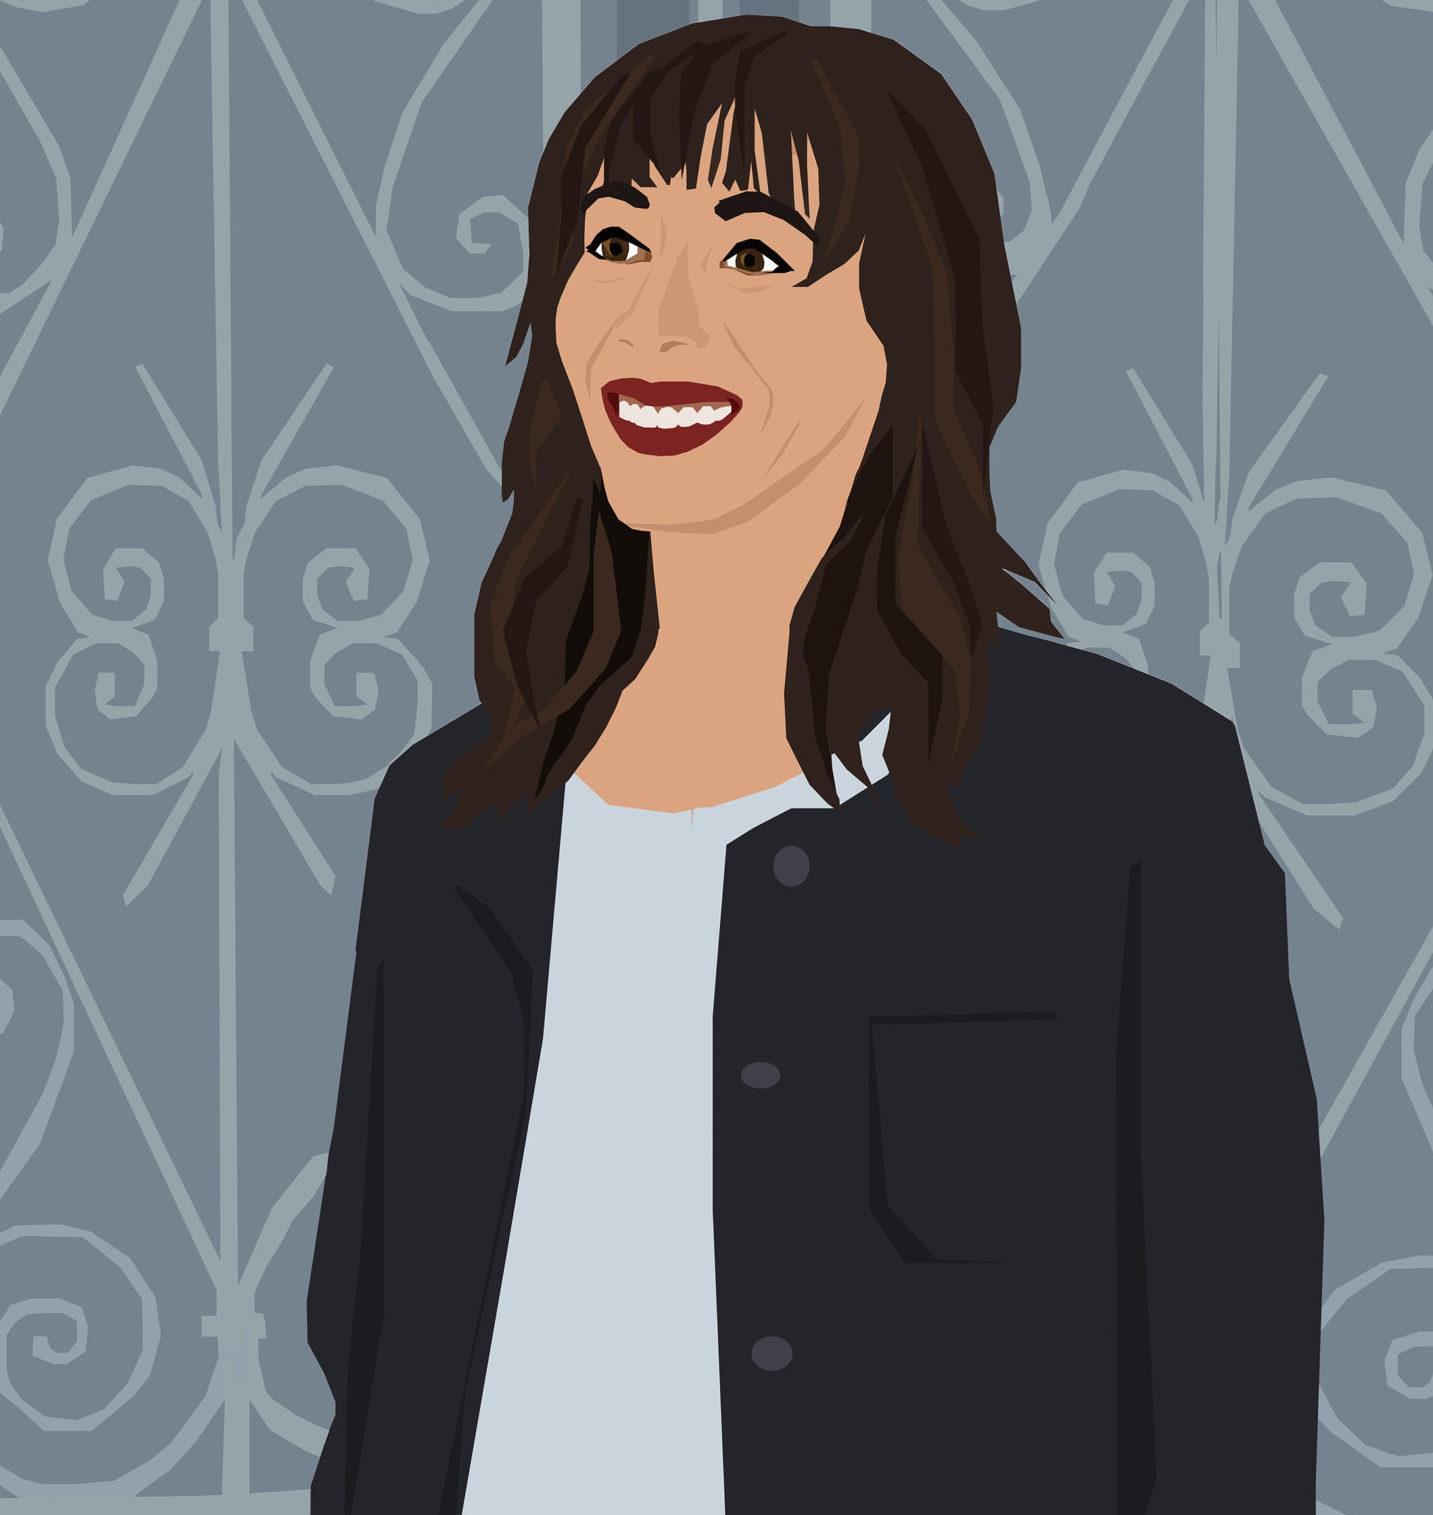 Portrait by the graphic artist Karina Mansfield. December 2019